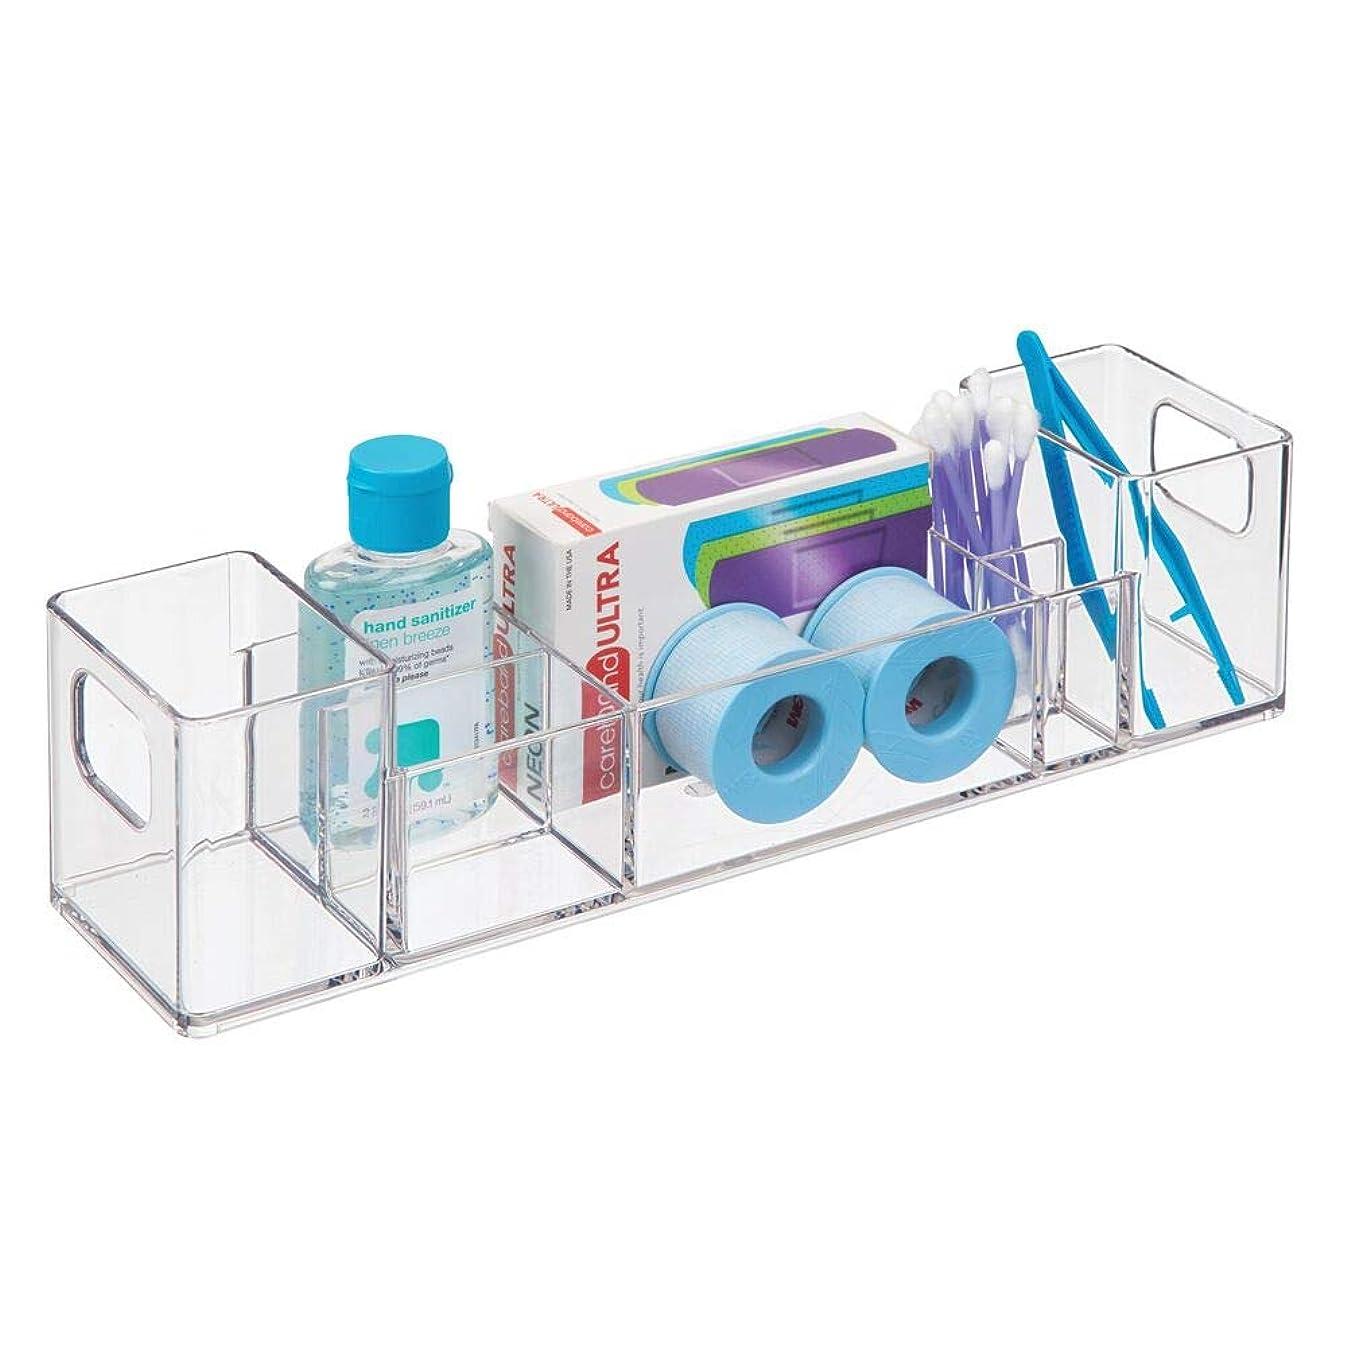 mDesign Slim Plastic Bathroom Vanity, Countertop, Cabinet Storage Organizer with Handles - Holds Vitamins, Medical Supplies, First-Aid, Makeup - 12